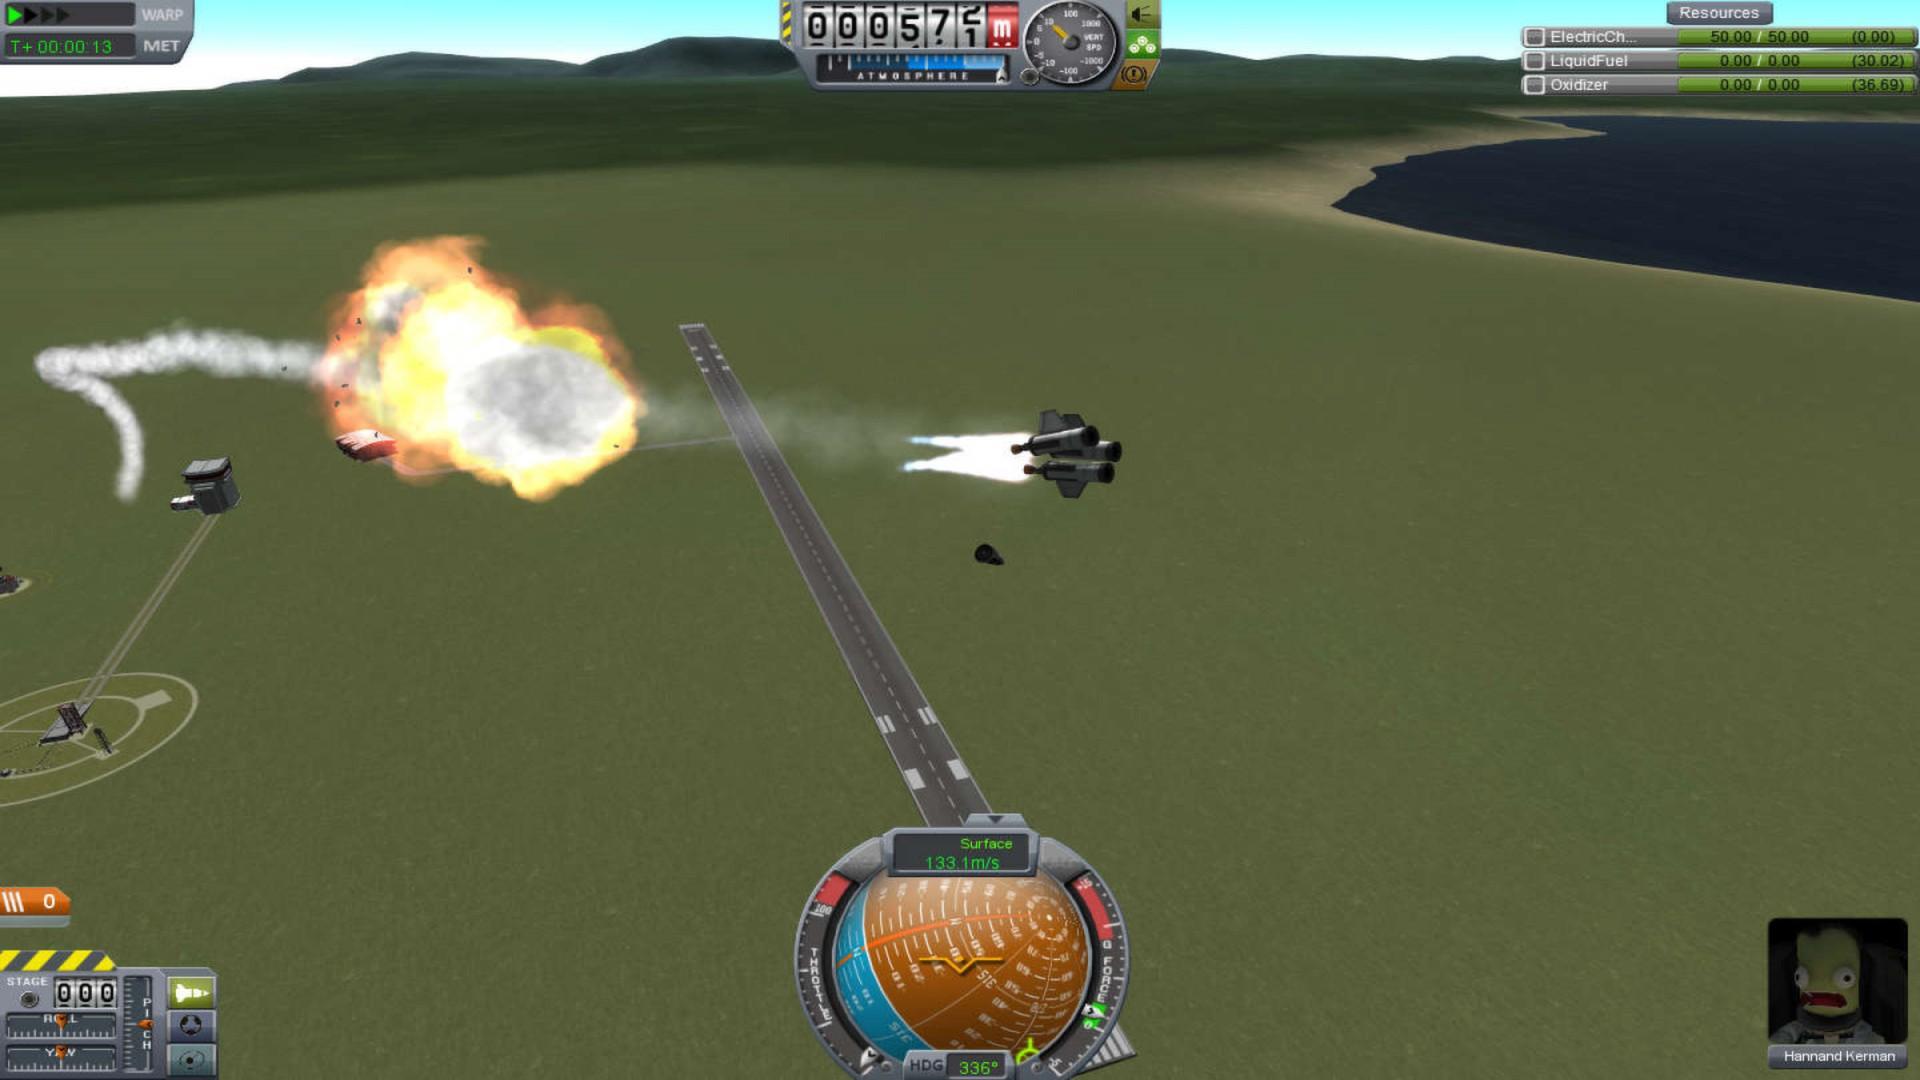 kerbal space program download